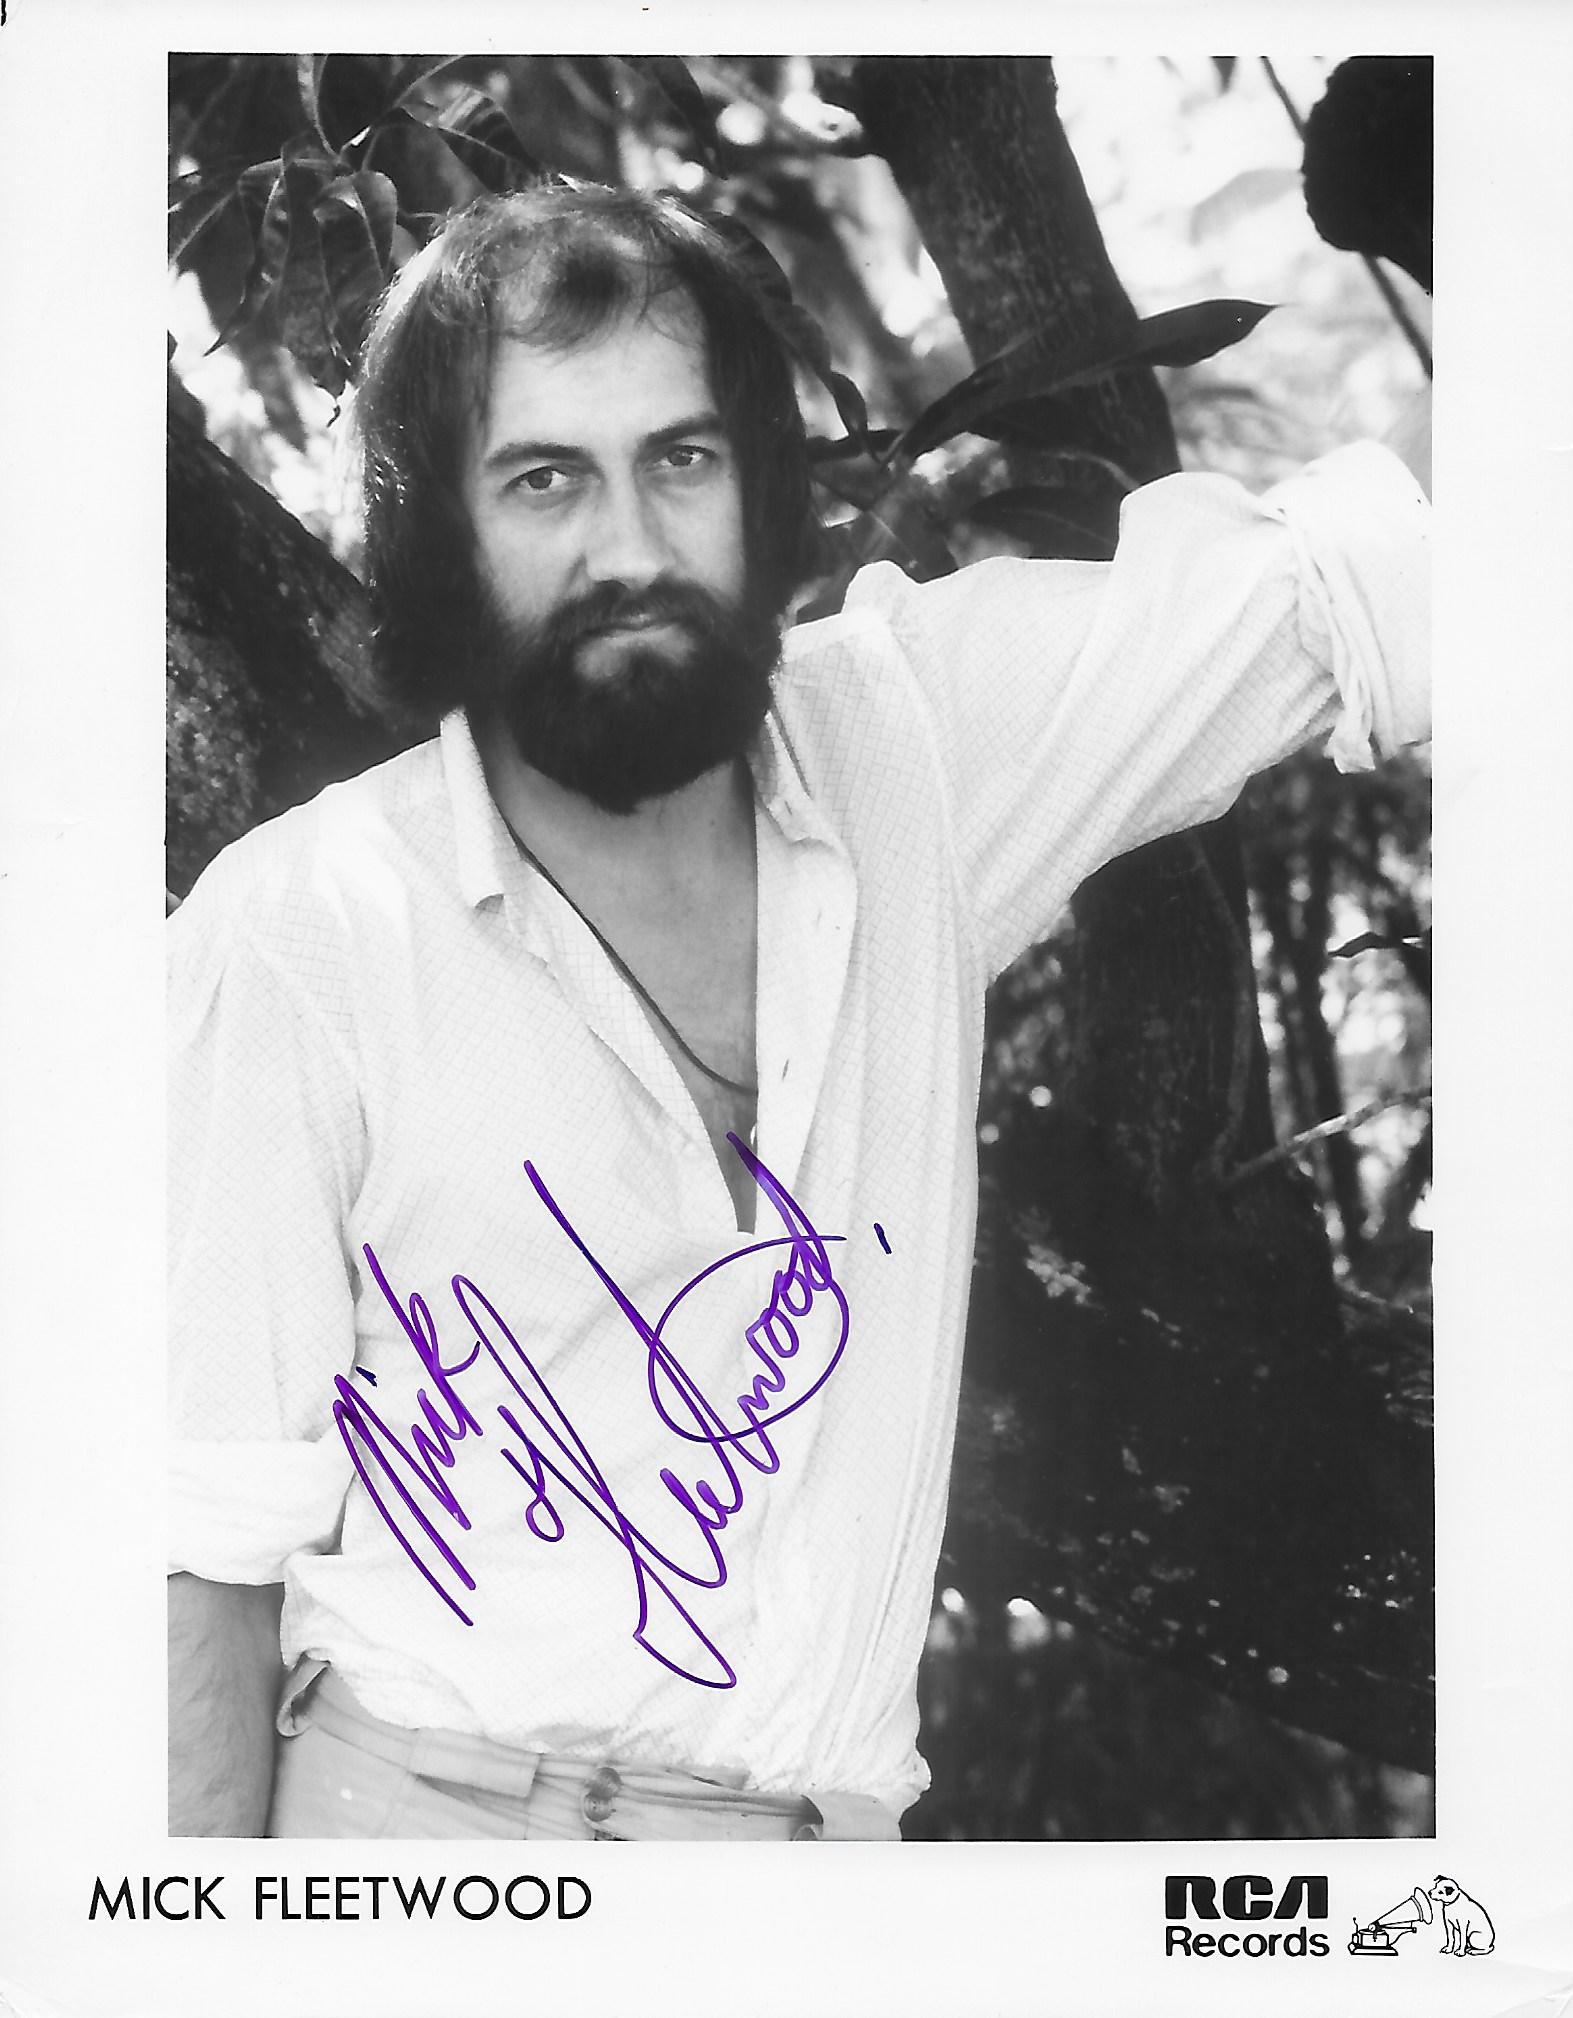 Fleetwood Mac Photo #1